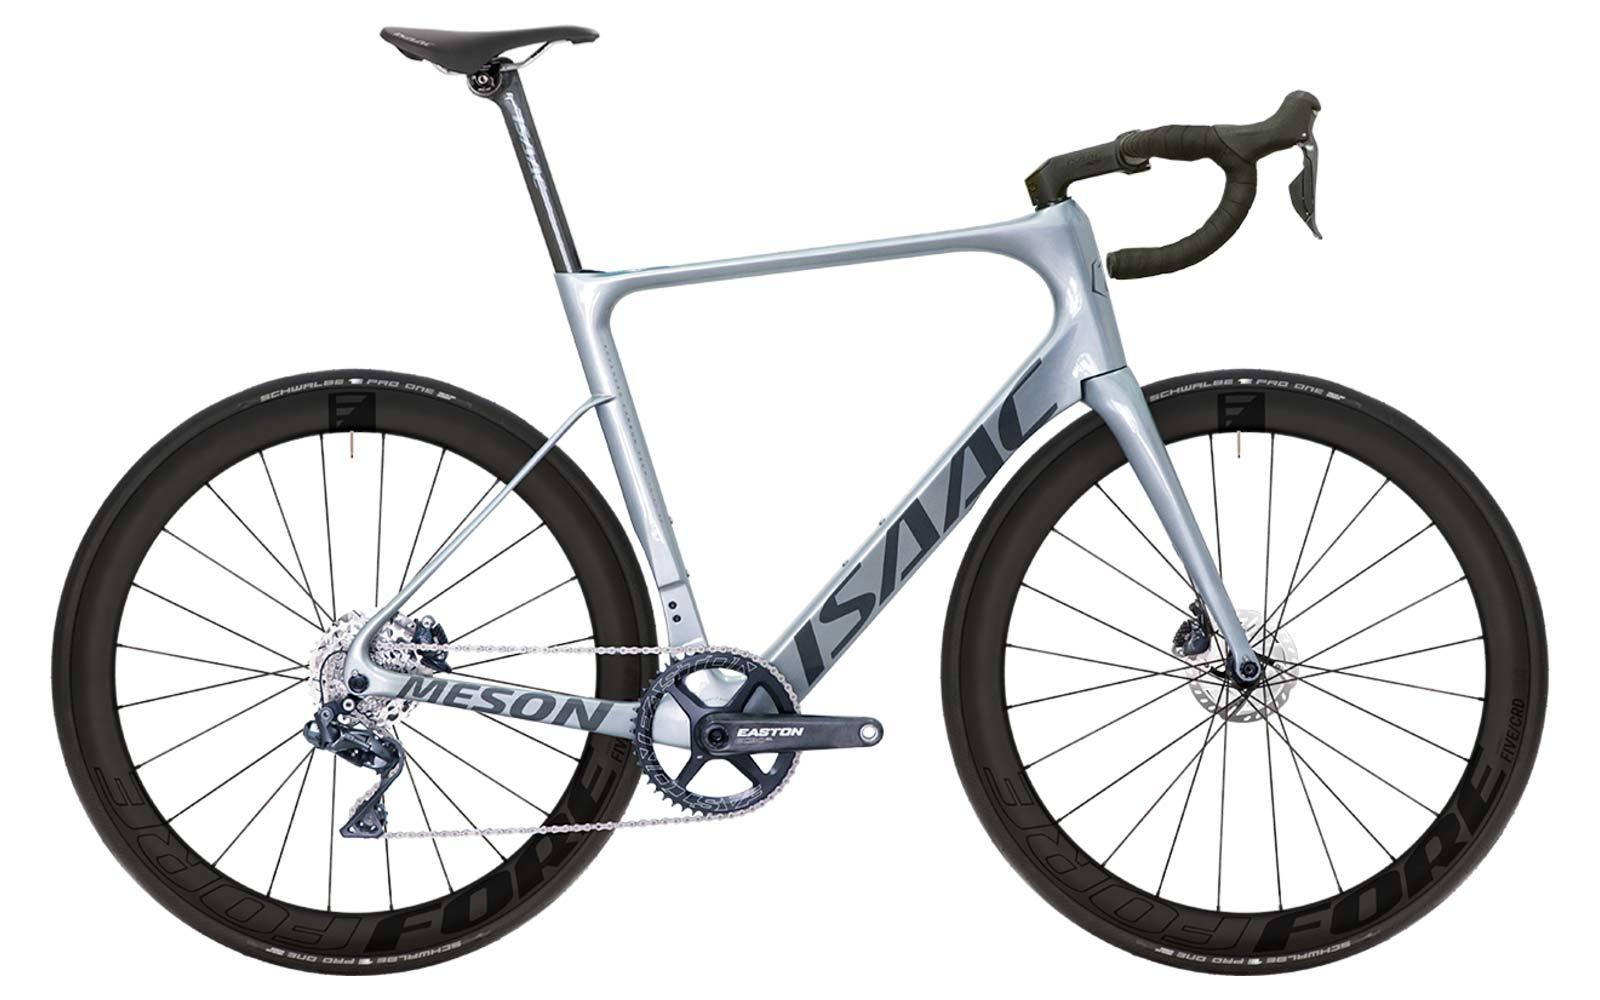 Isaac Meson X Classified 1x aero road bike, wireless electronic internal gear hub 2x11 carbon road race bike,complete